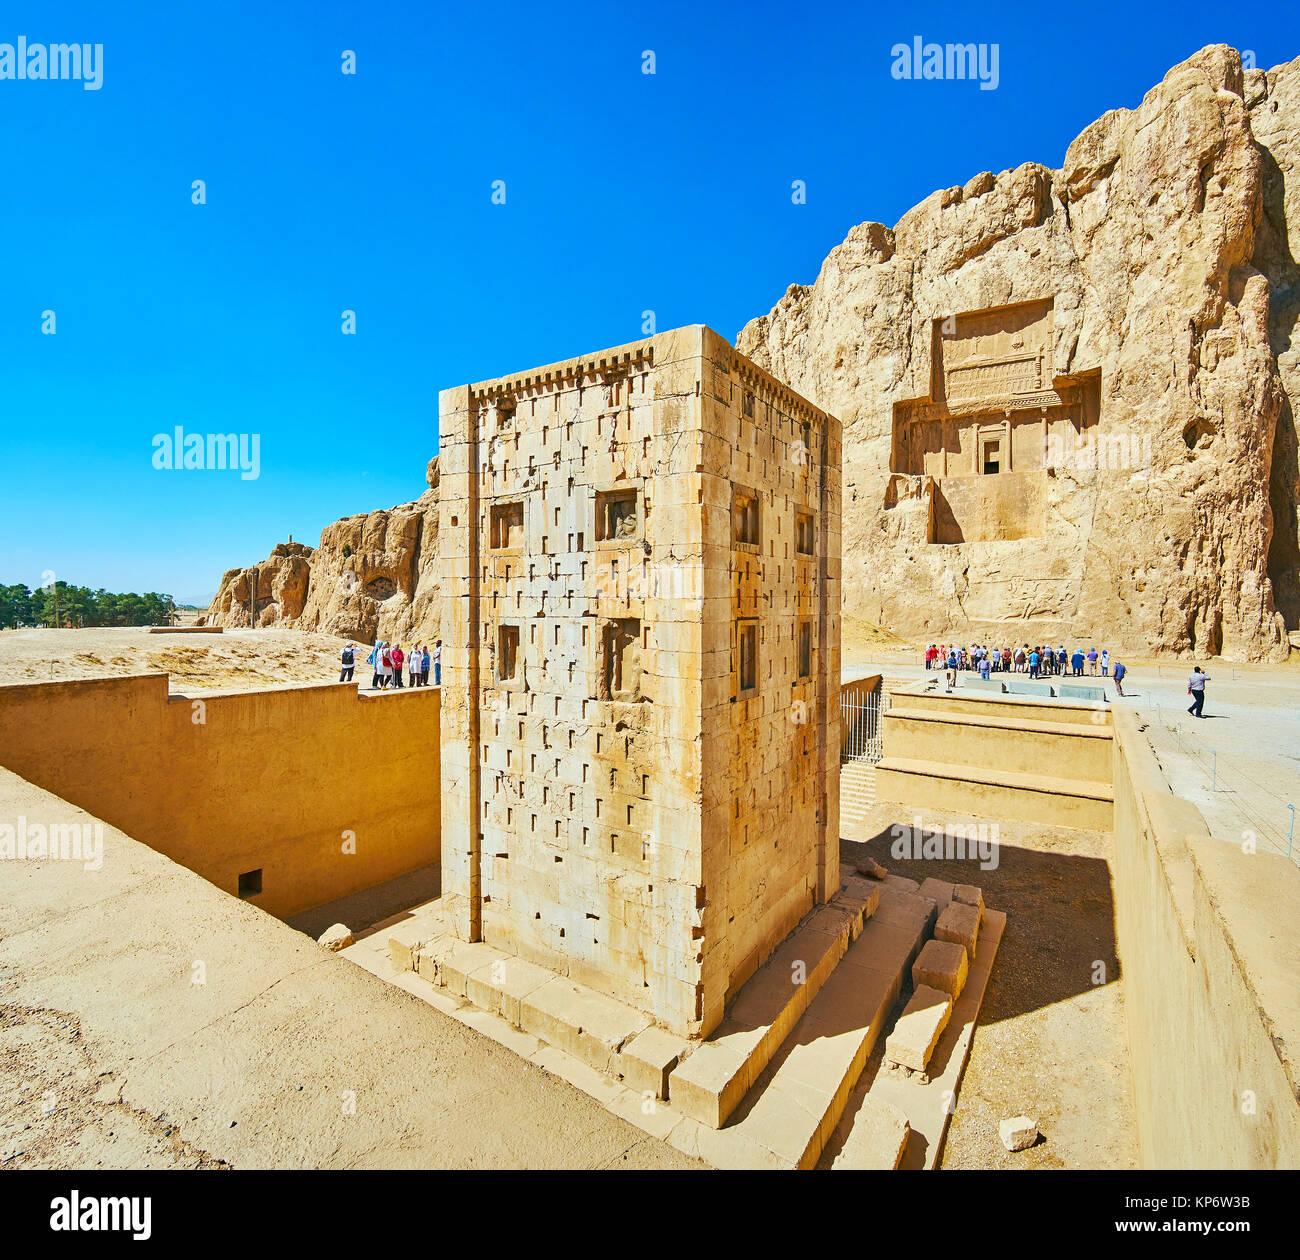 NAQSH-E RUSTAM, IRAN - OCTOBER 13, 2017: Discover Ka'ba-ye Zartosht tower and ancient mausoleums in rock in - Stock Image